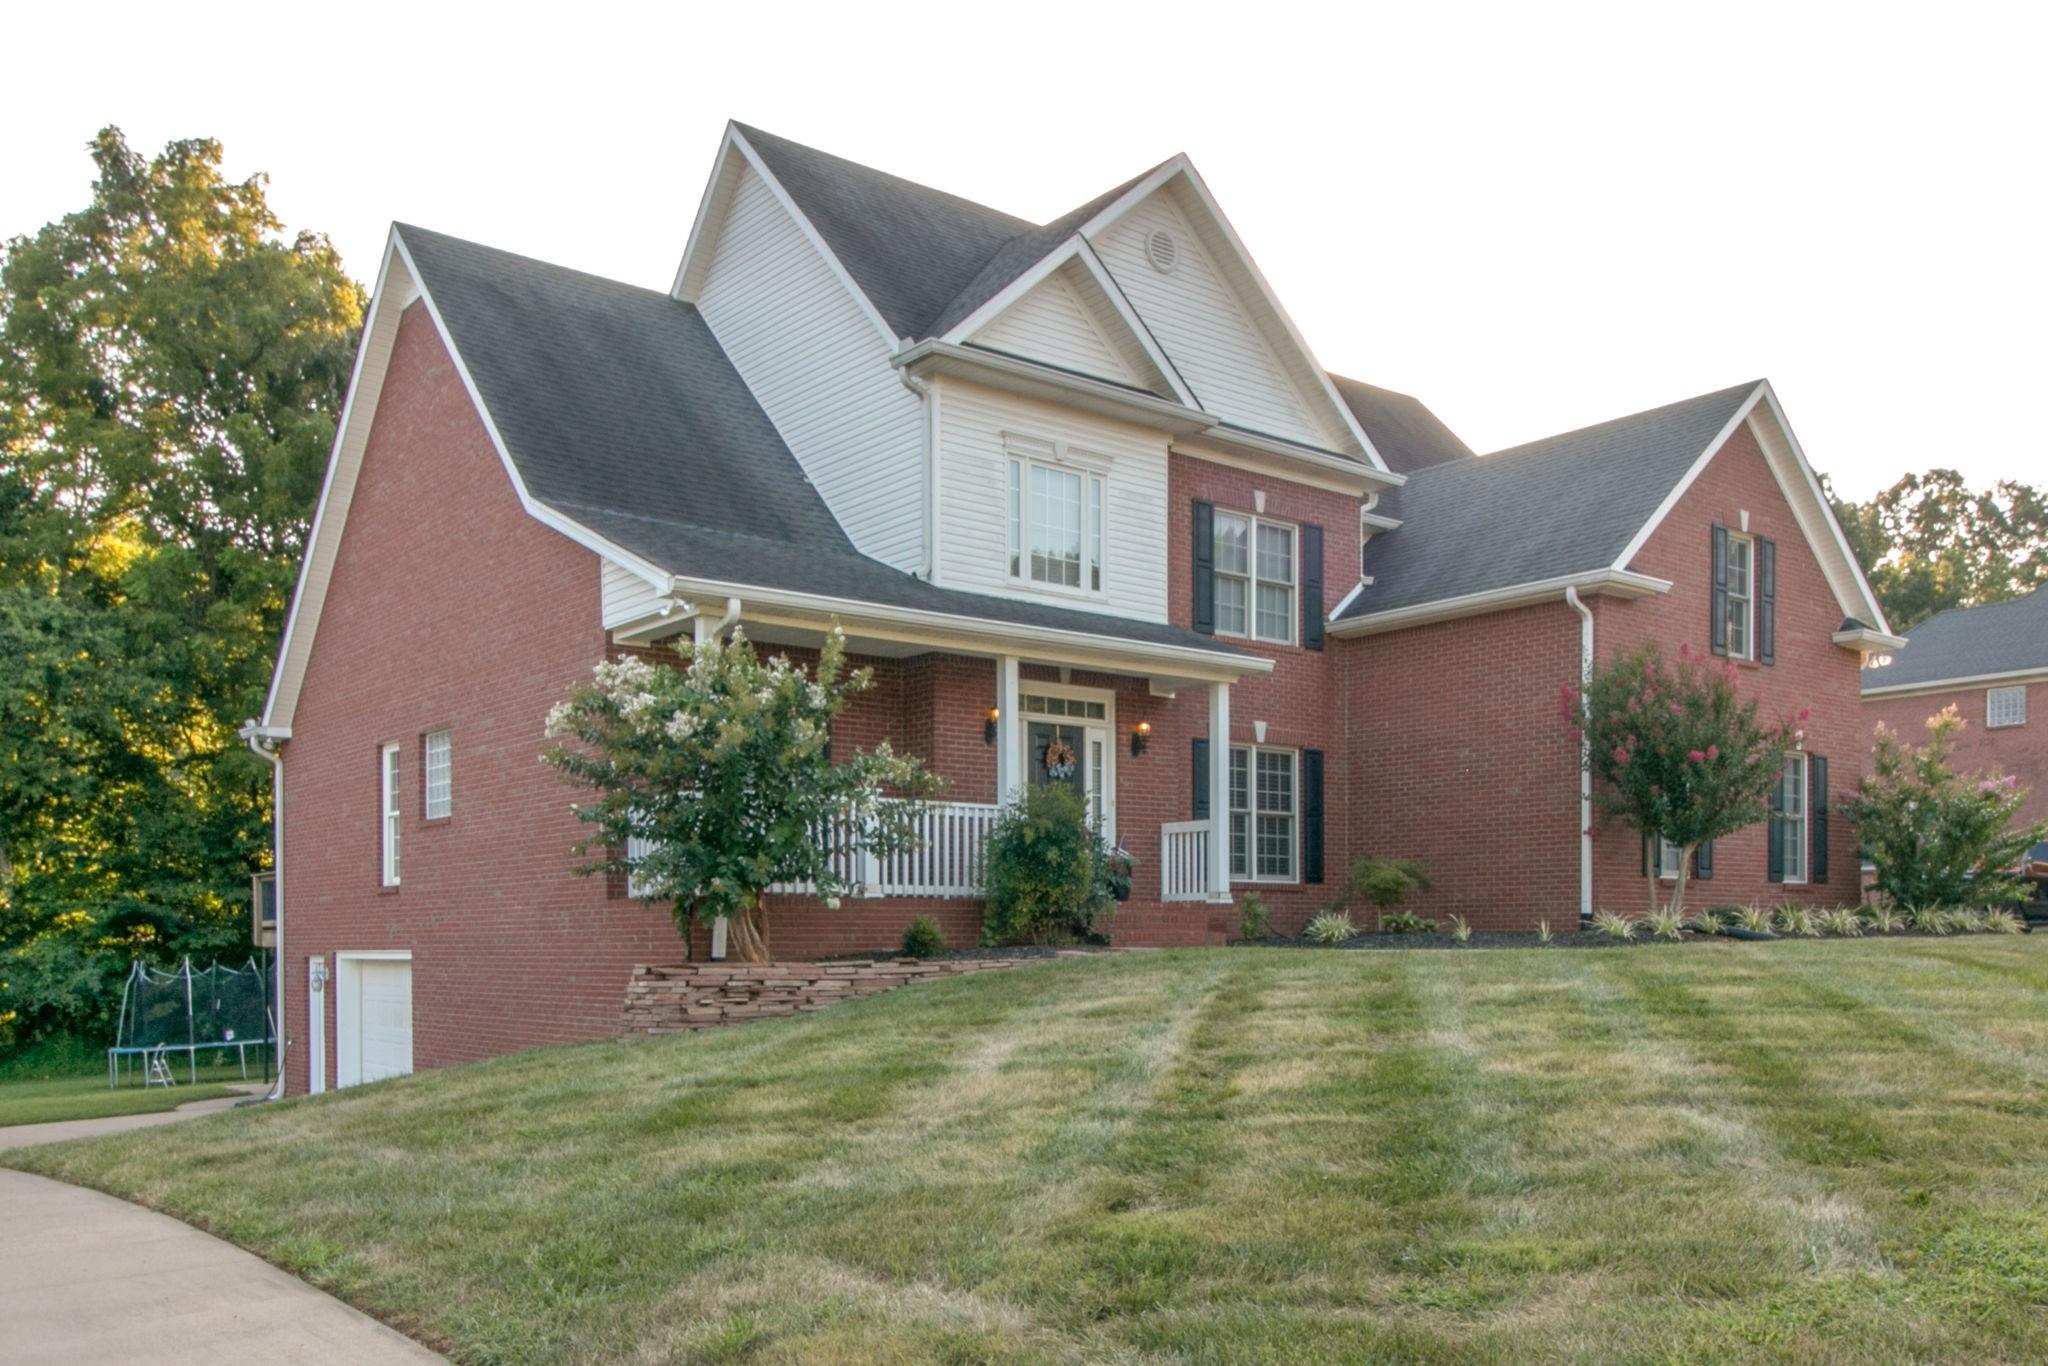 2046 Mossy Oak Cir, Clarksville, TN 37043 - Clarksville, TN real estate listing